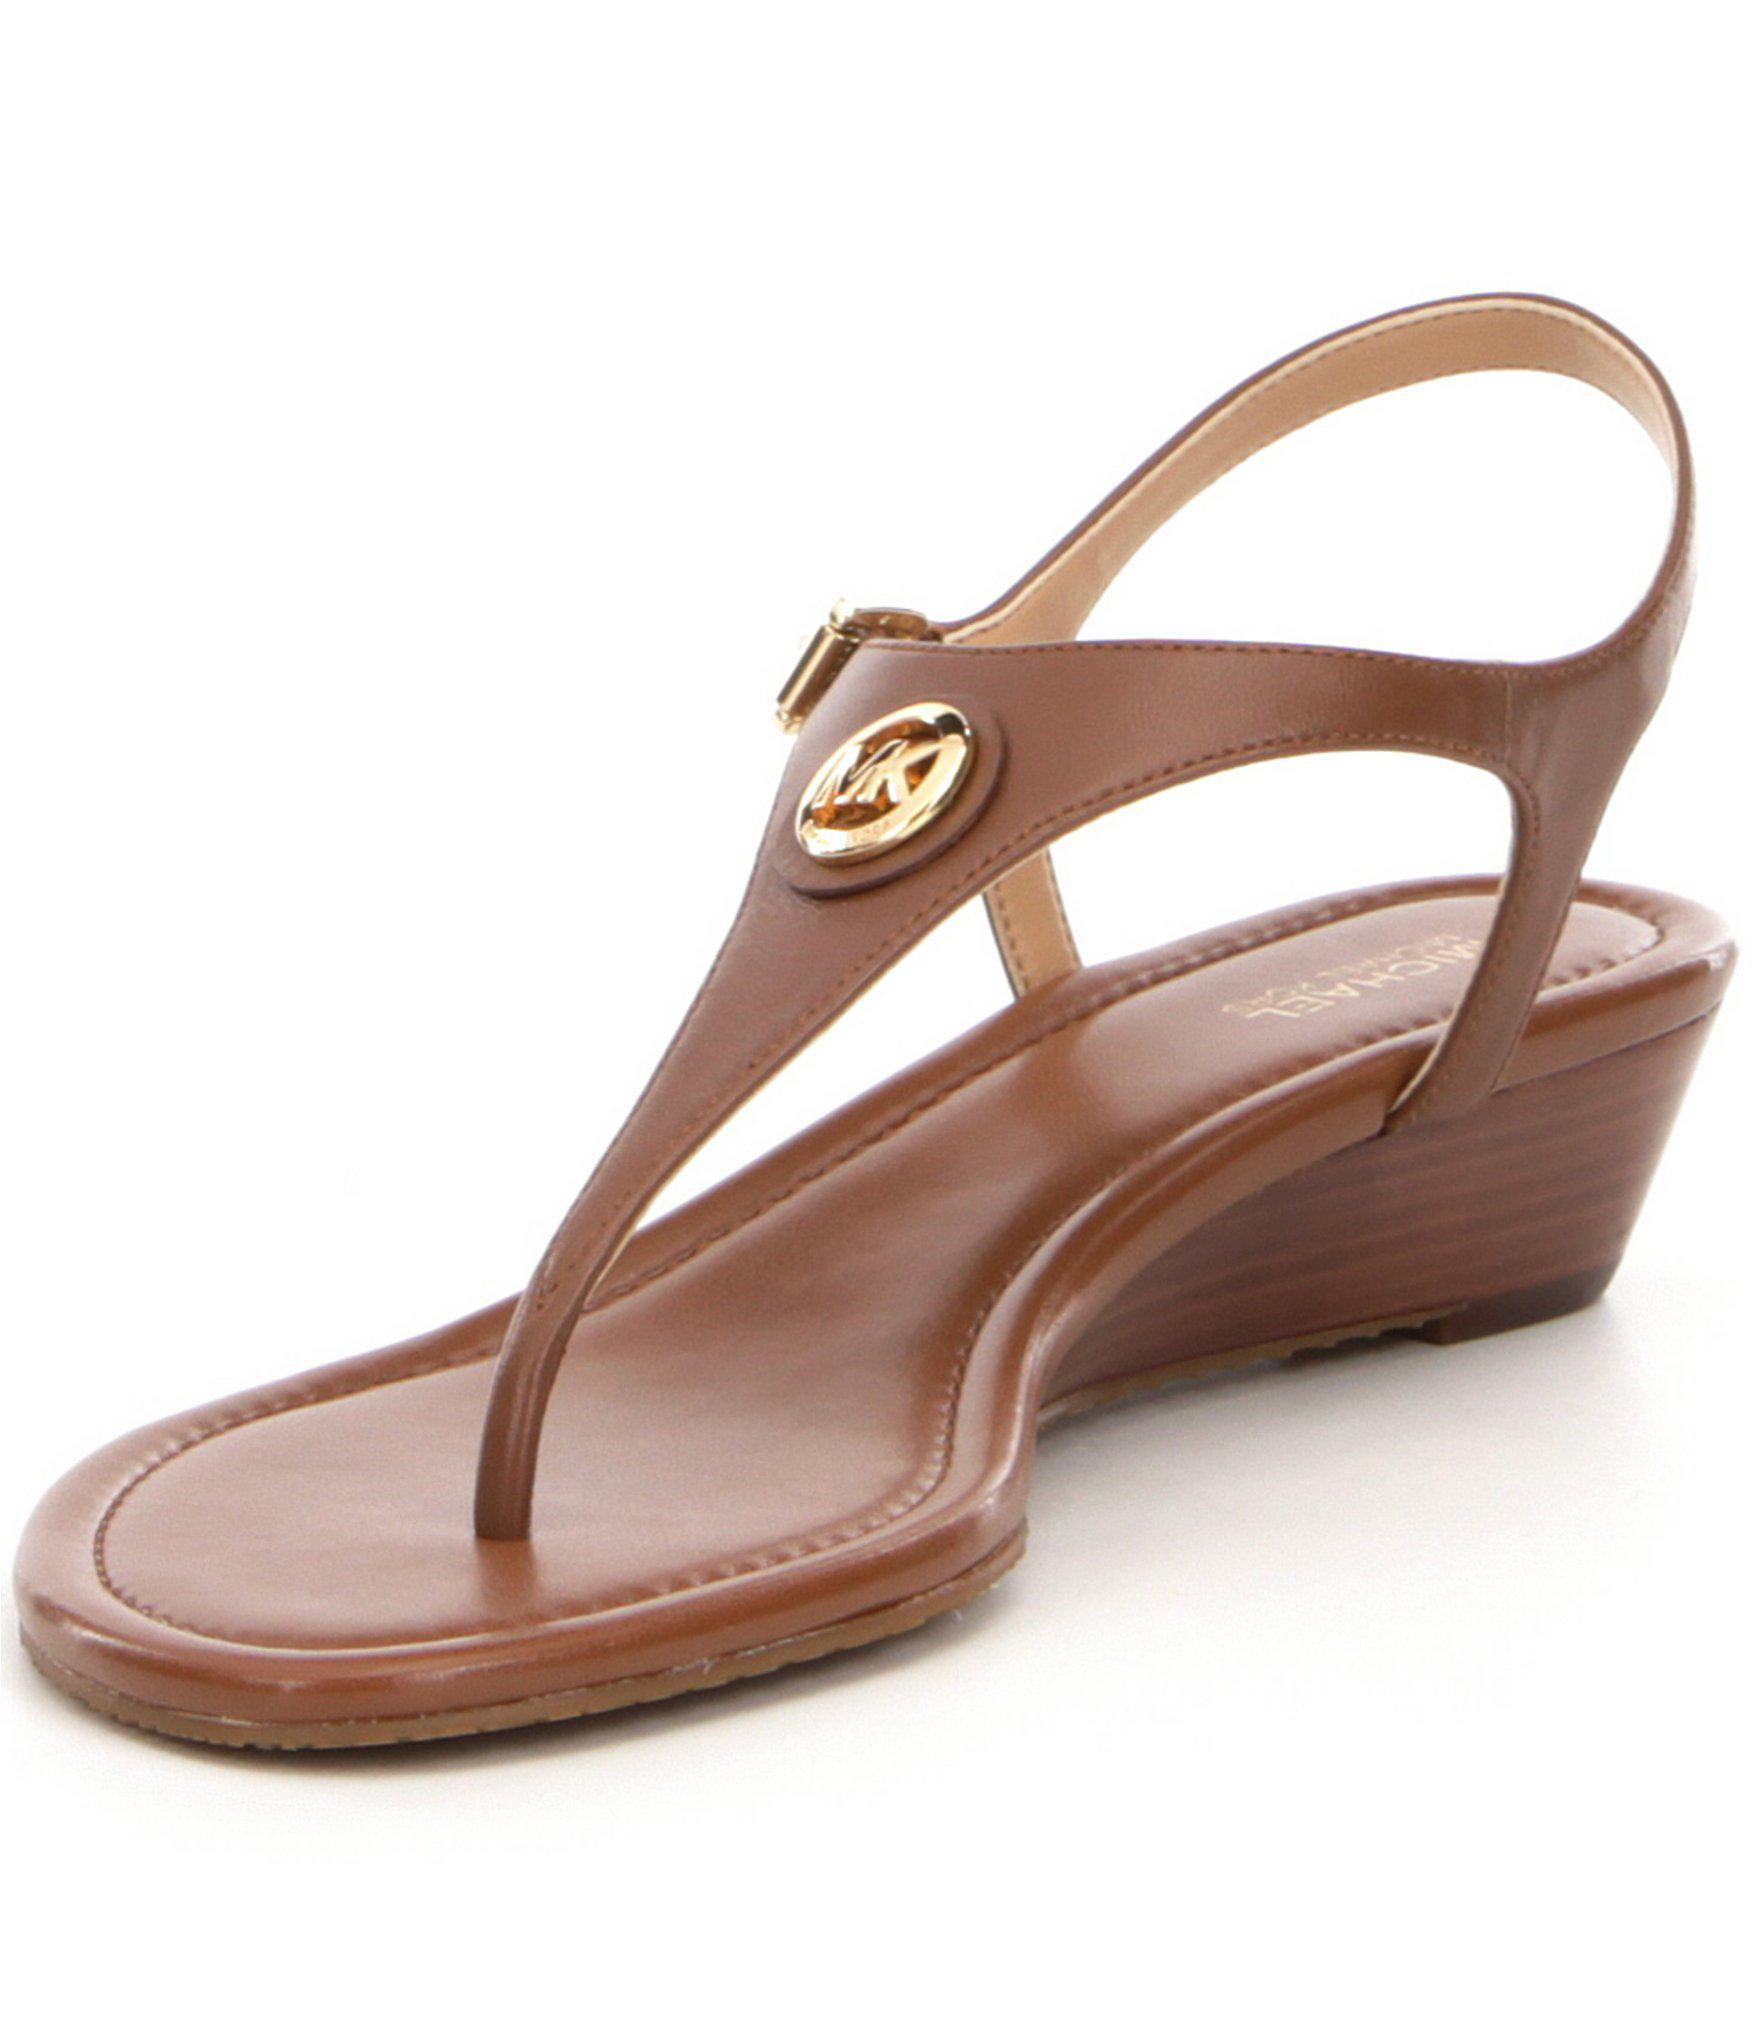 30db96032d4a Lyst - MICHAEL Michael Kors Ramona Wedge Sandals in Brown